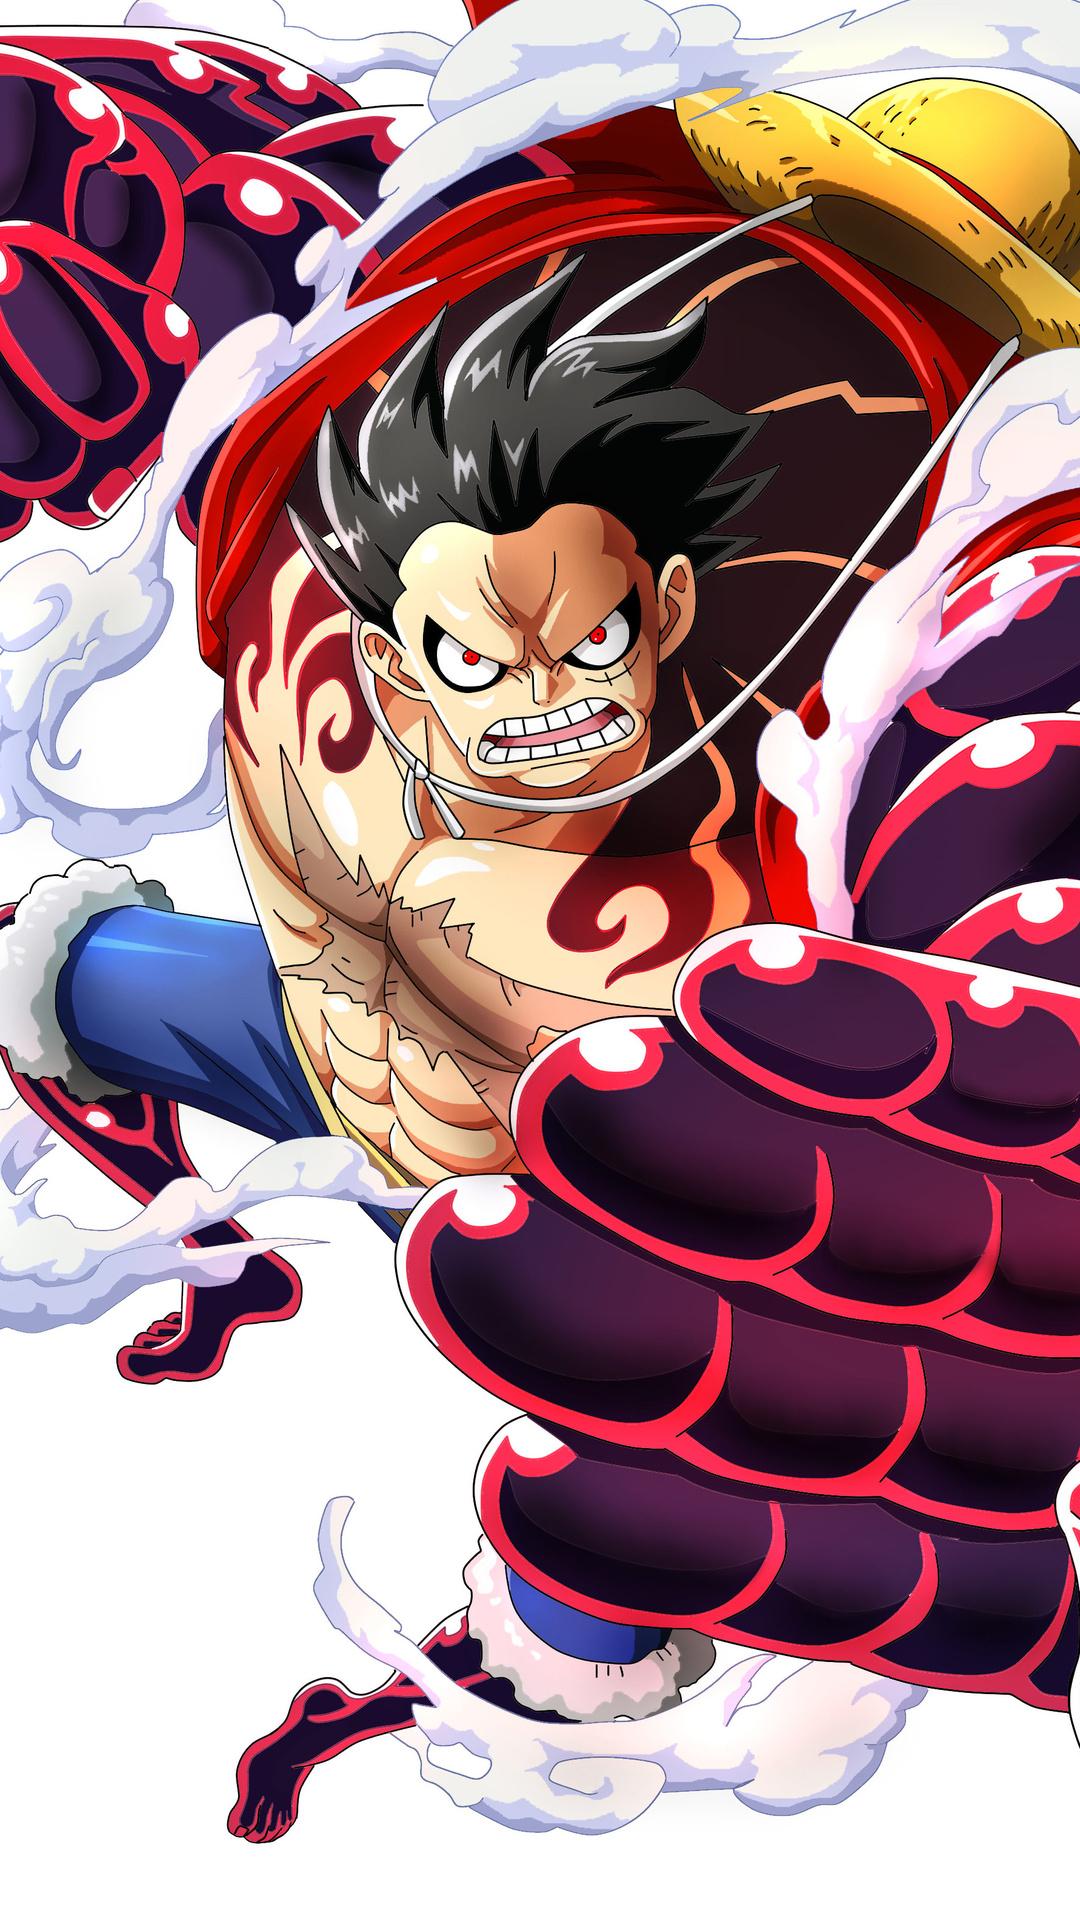 Cute One Piece Wallpaper Hd 1080x1920 Monkey D Luffy One Piece Iphone 7 6s 6 Plus